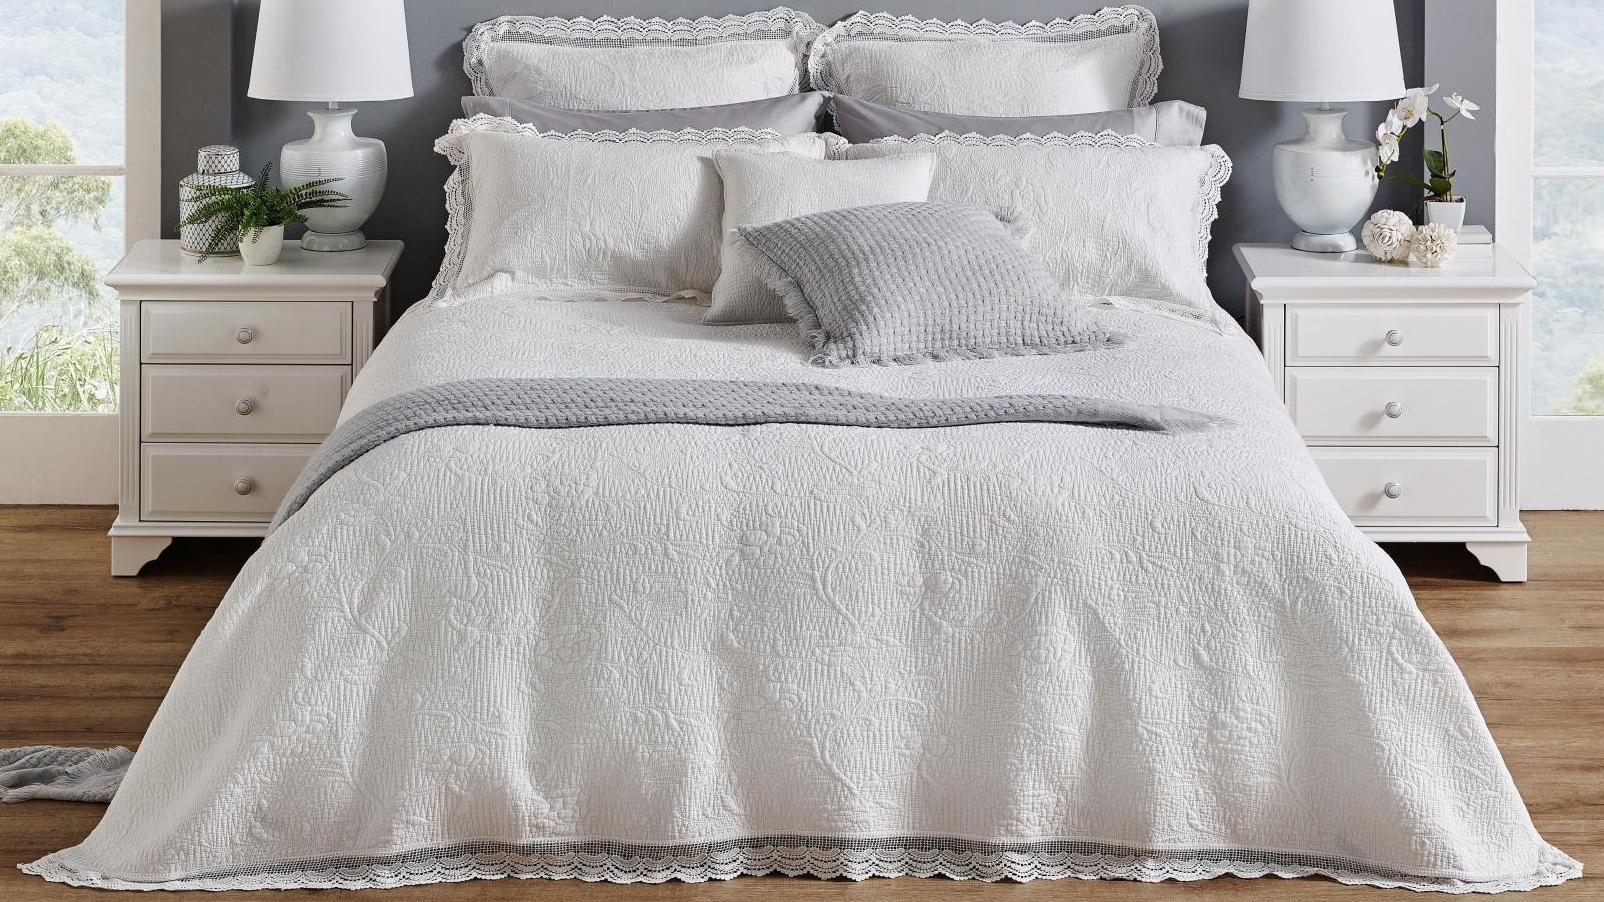 Buy L Avenue Tallulah White Coverlet Set Harvey Norman Au